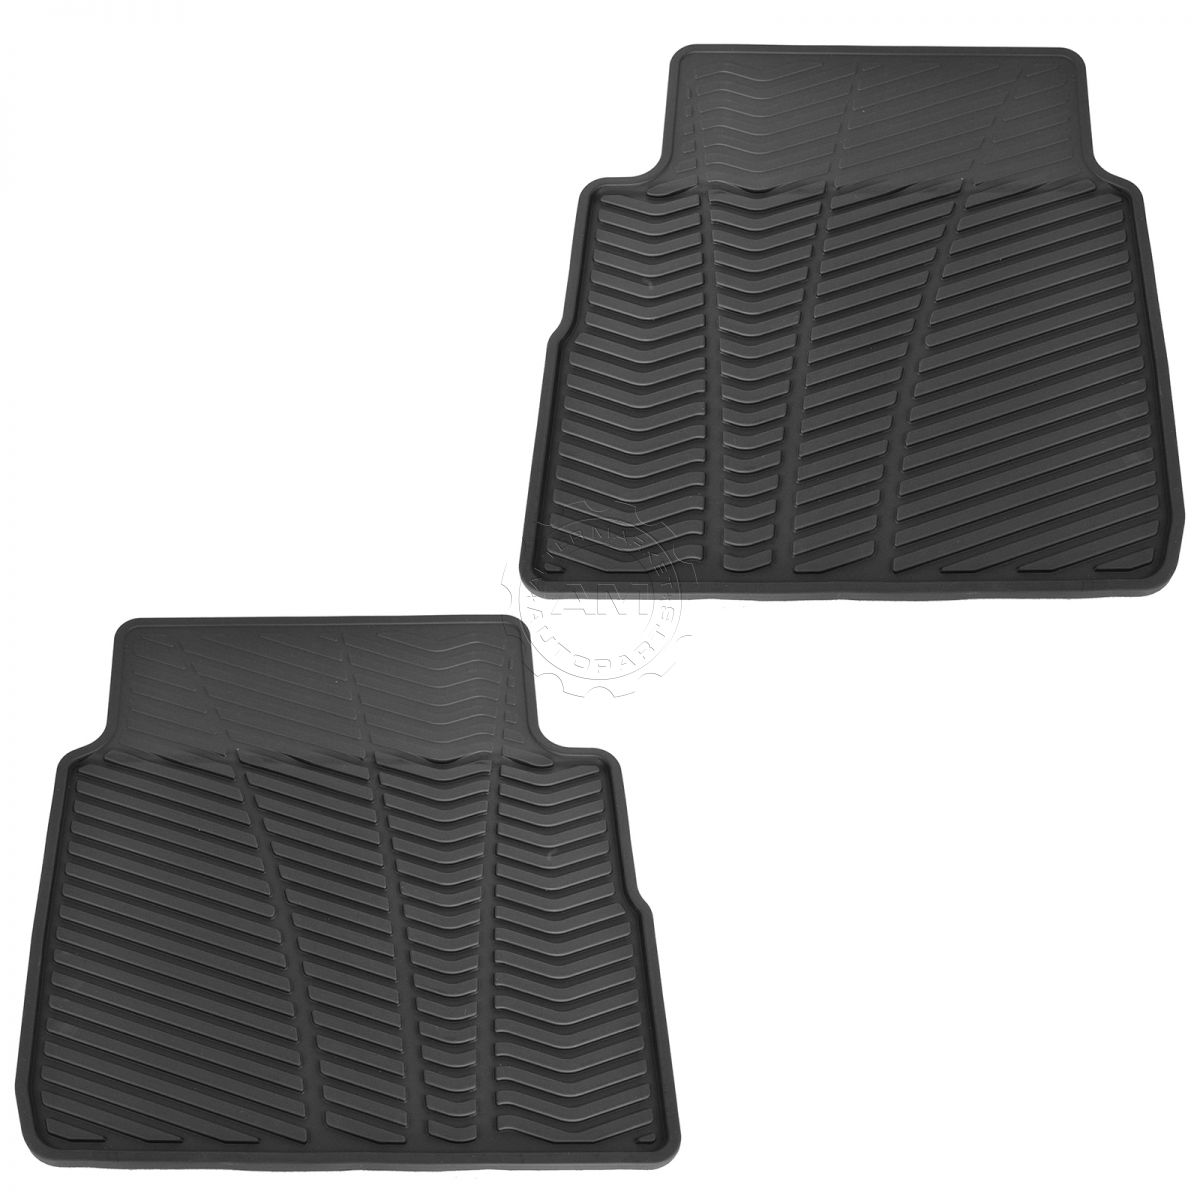 maxpider sonata fits hyundai tan listings floor mats k headlight kagu